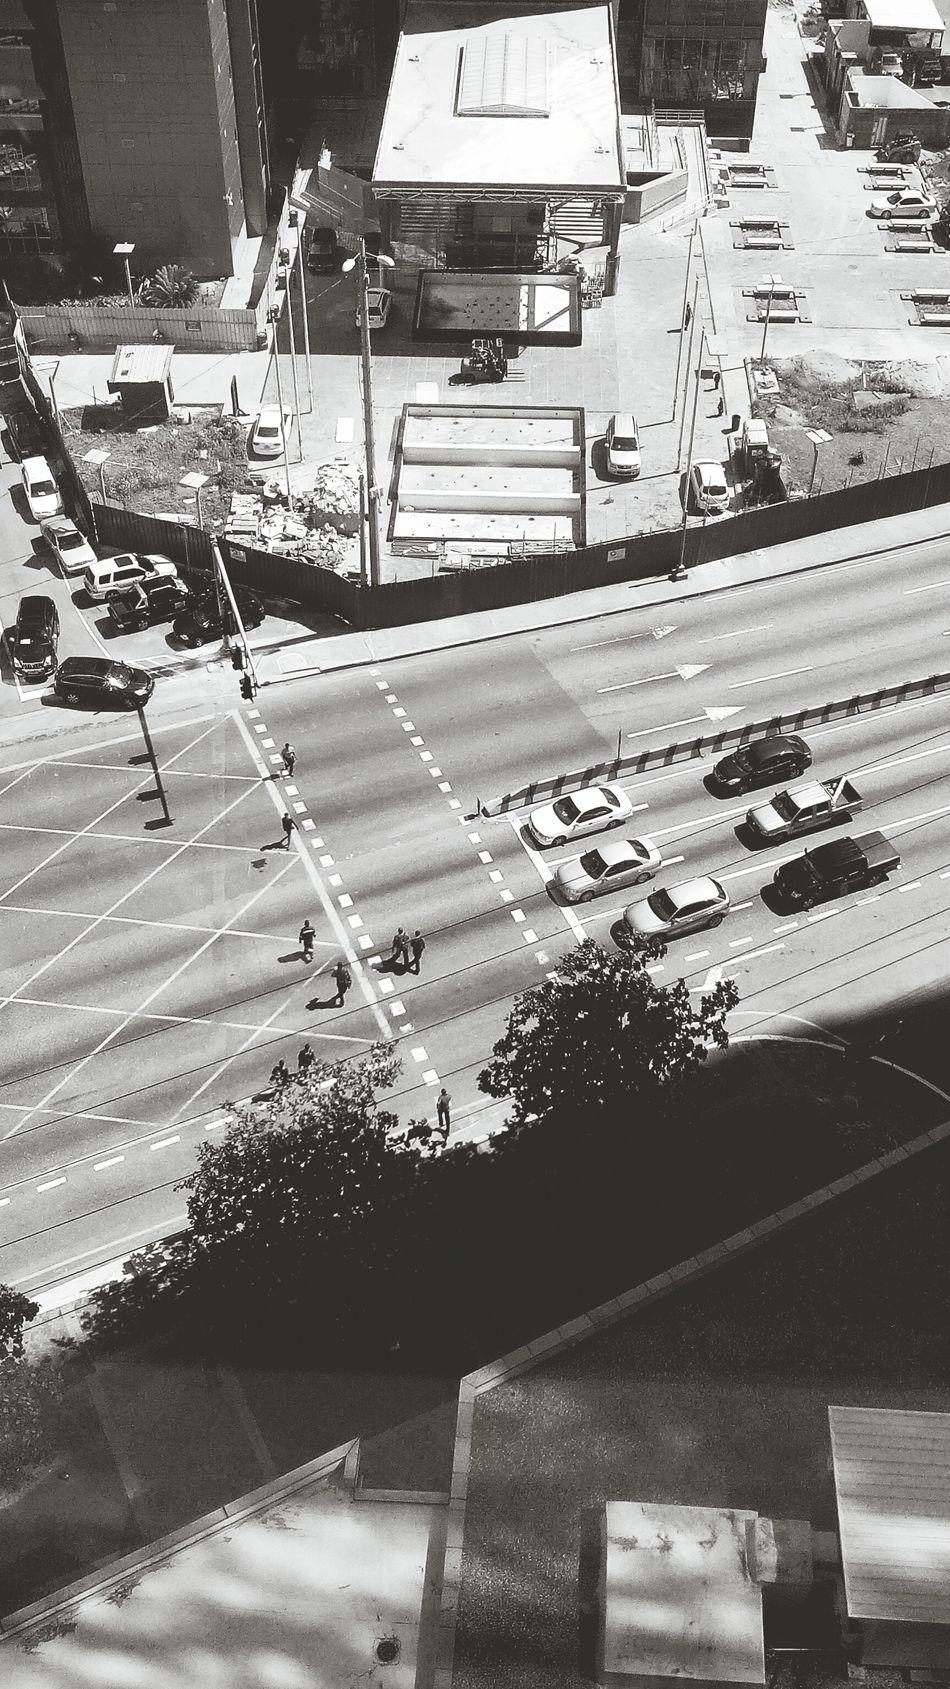 Citylife Cityscapes City City View  City Street Cityexplorer Tarmac Car Cars Transportation Traffic Traffic Lights Trinidad And Tobago Pedestrian People Whydidthepeoplecrosstheroad BluStudio5+5 PhonePhotography Afternoon HotSun EyeEmBestPics Eyemphotography EyeEm Nature Lover EyeEm Best Shots - Black + White EyeEm Best Shots